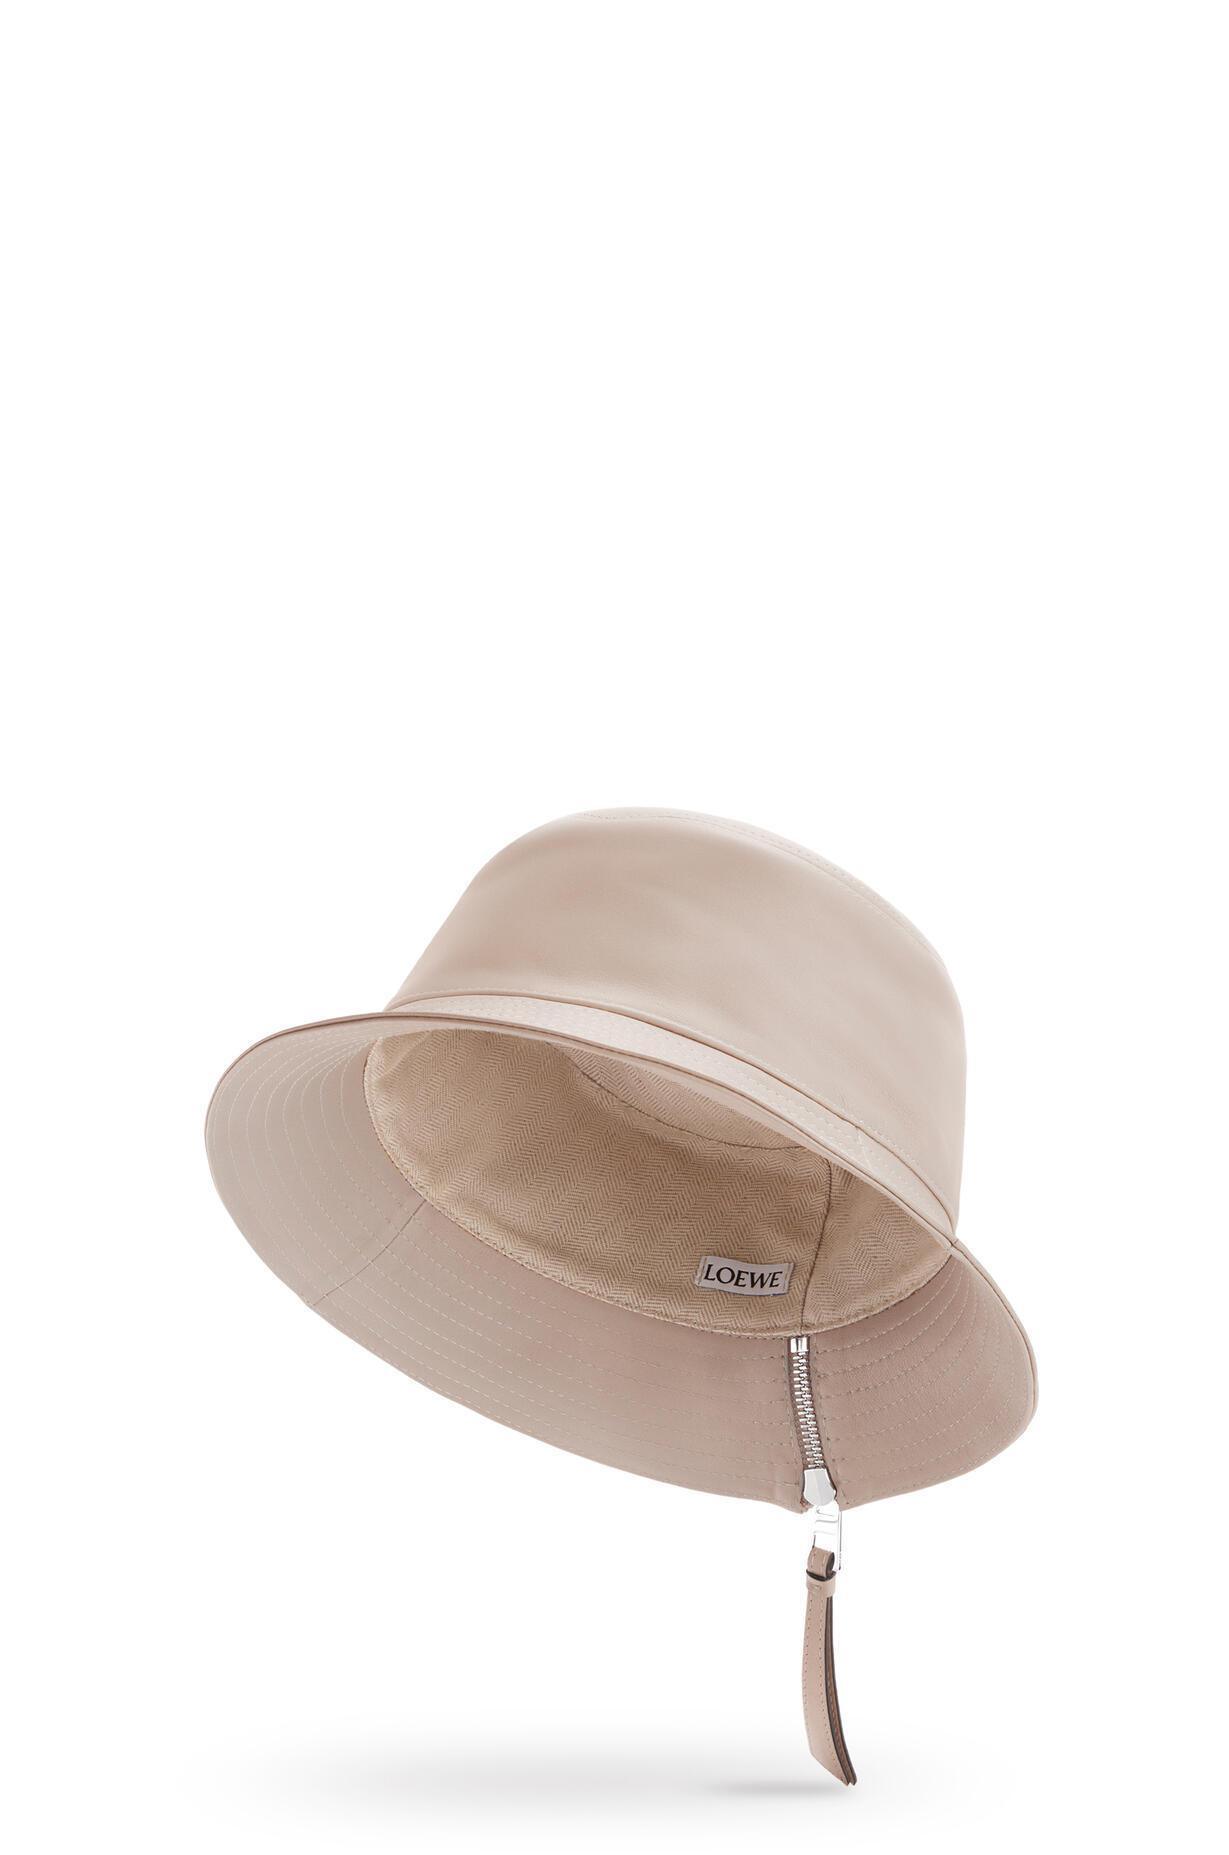 LOEWE LOEWE☆Fisherman hat in nappa calfskin☆112.10.010